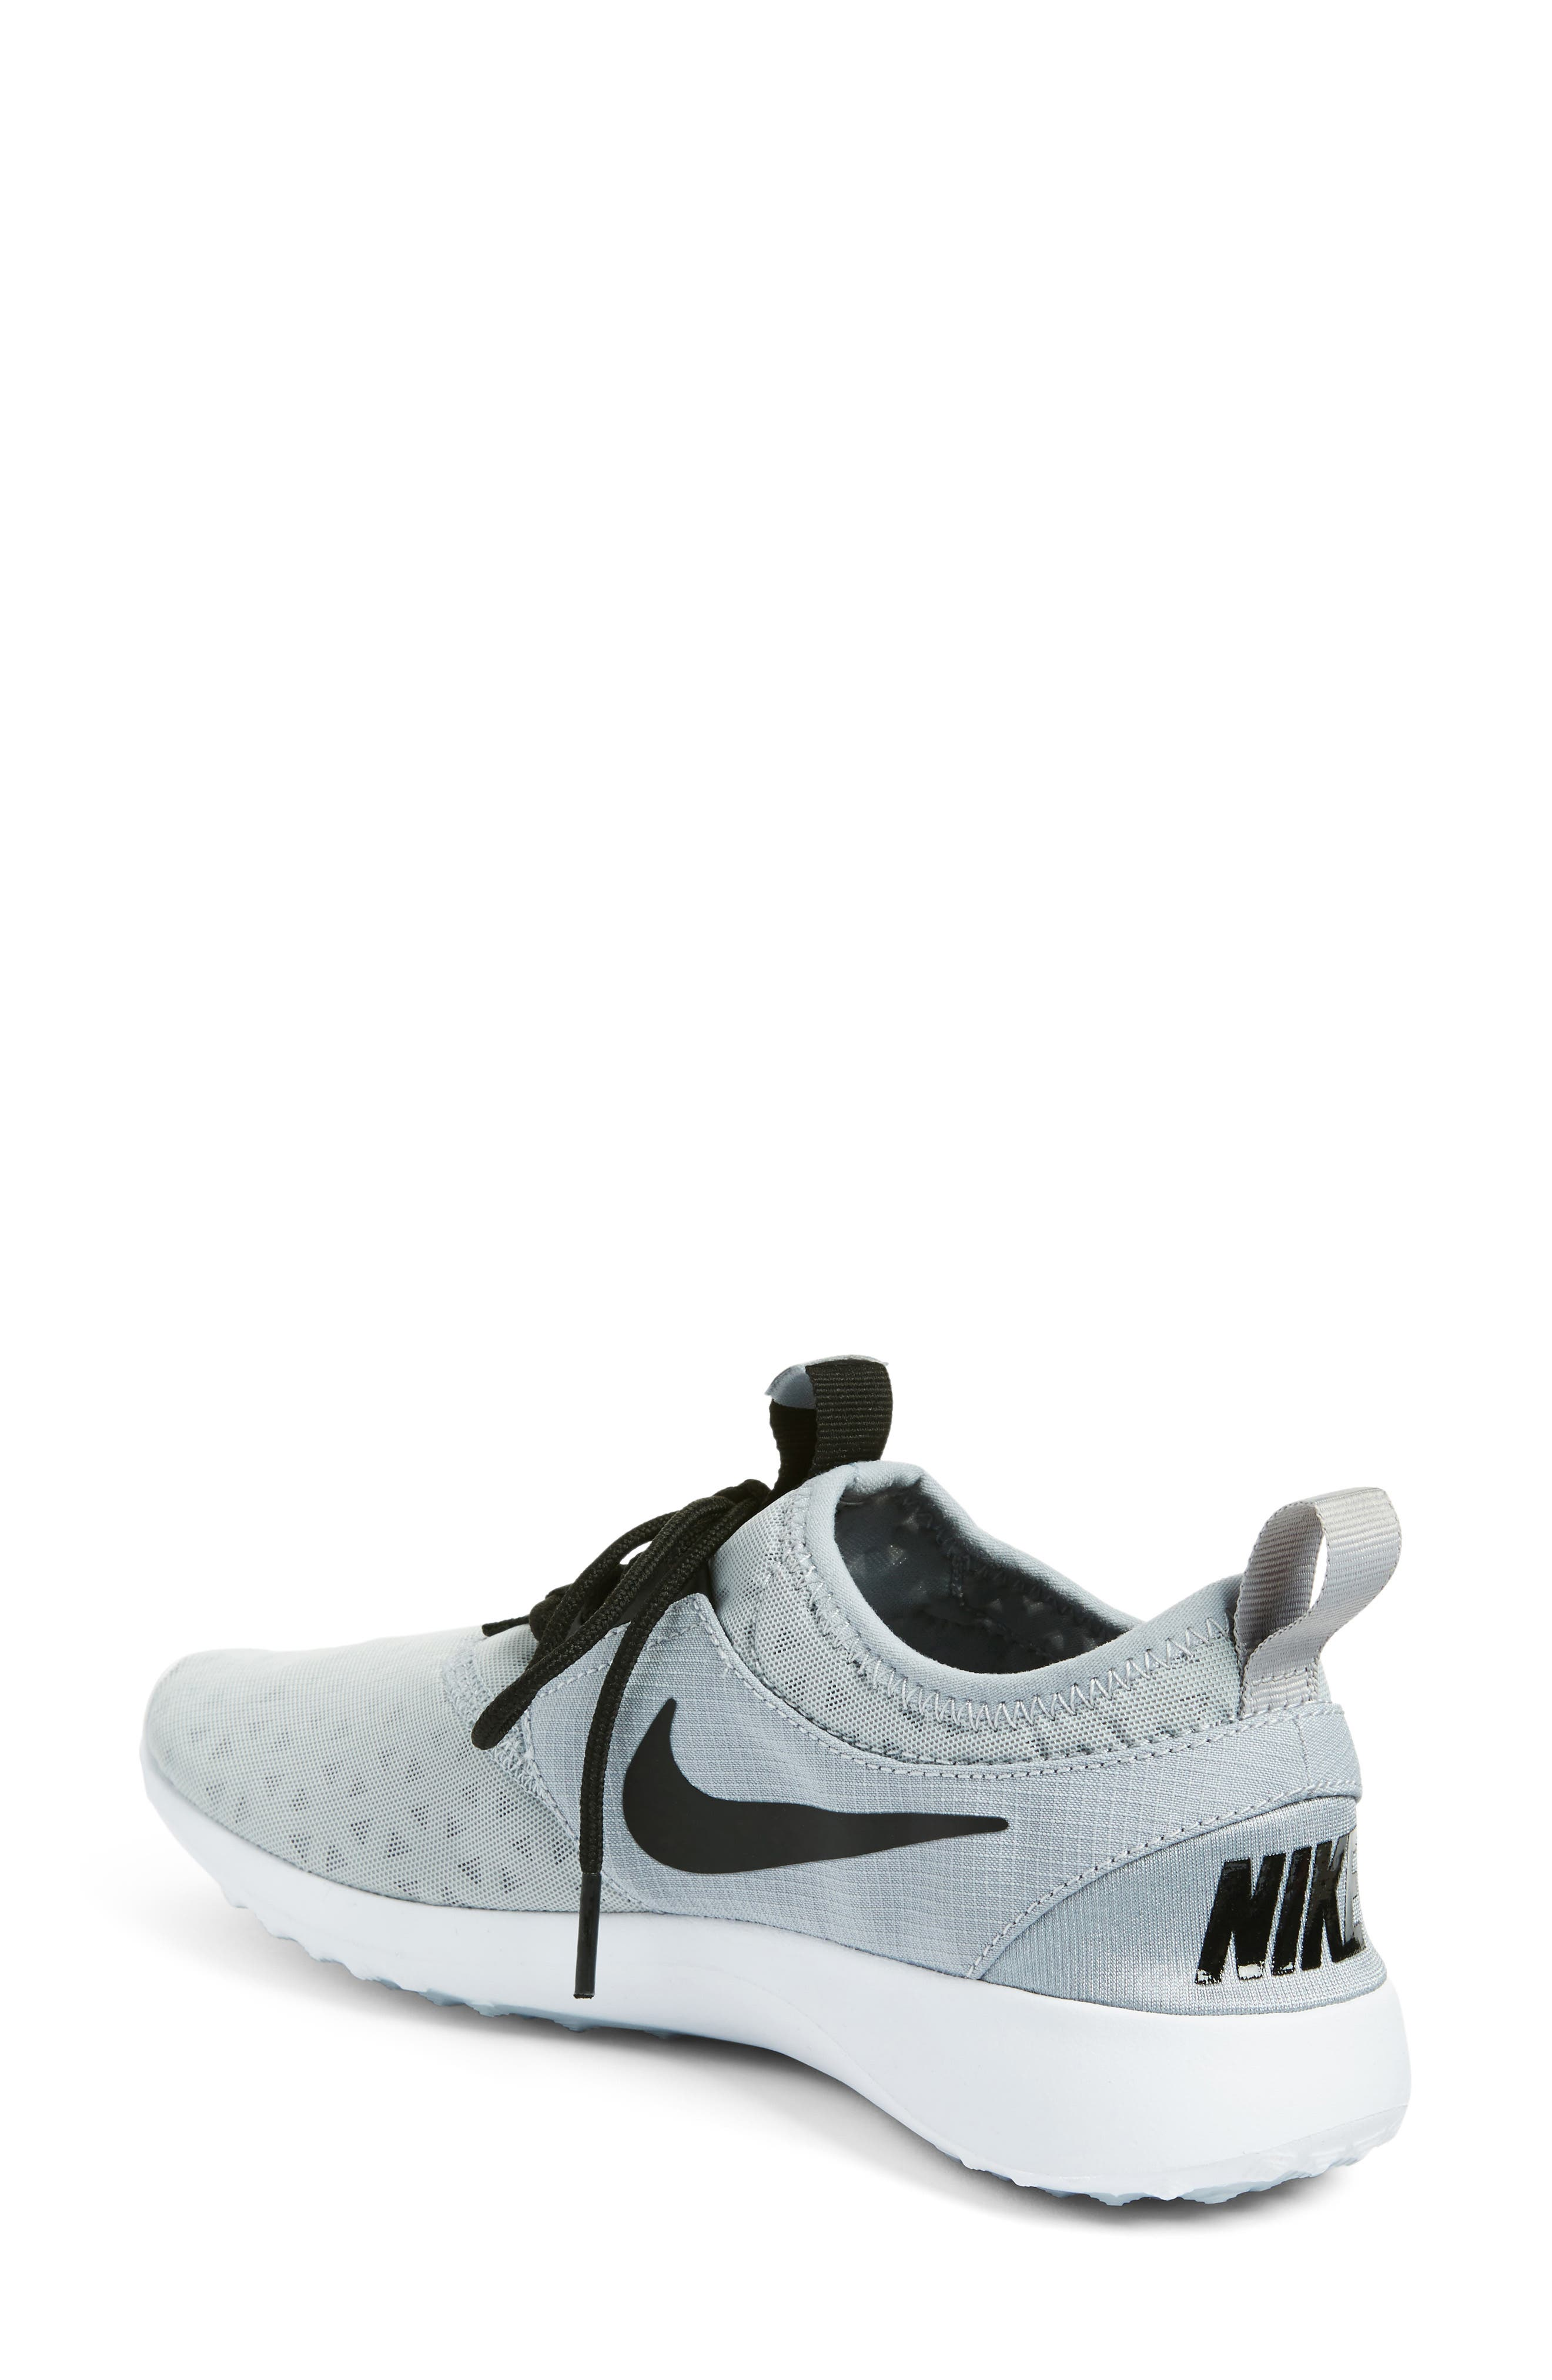 ,                             'Juvenate' Sneaker,                             Alternate thumbnail 83, color,                             035